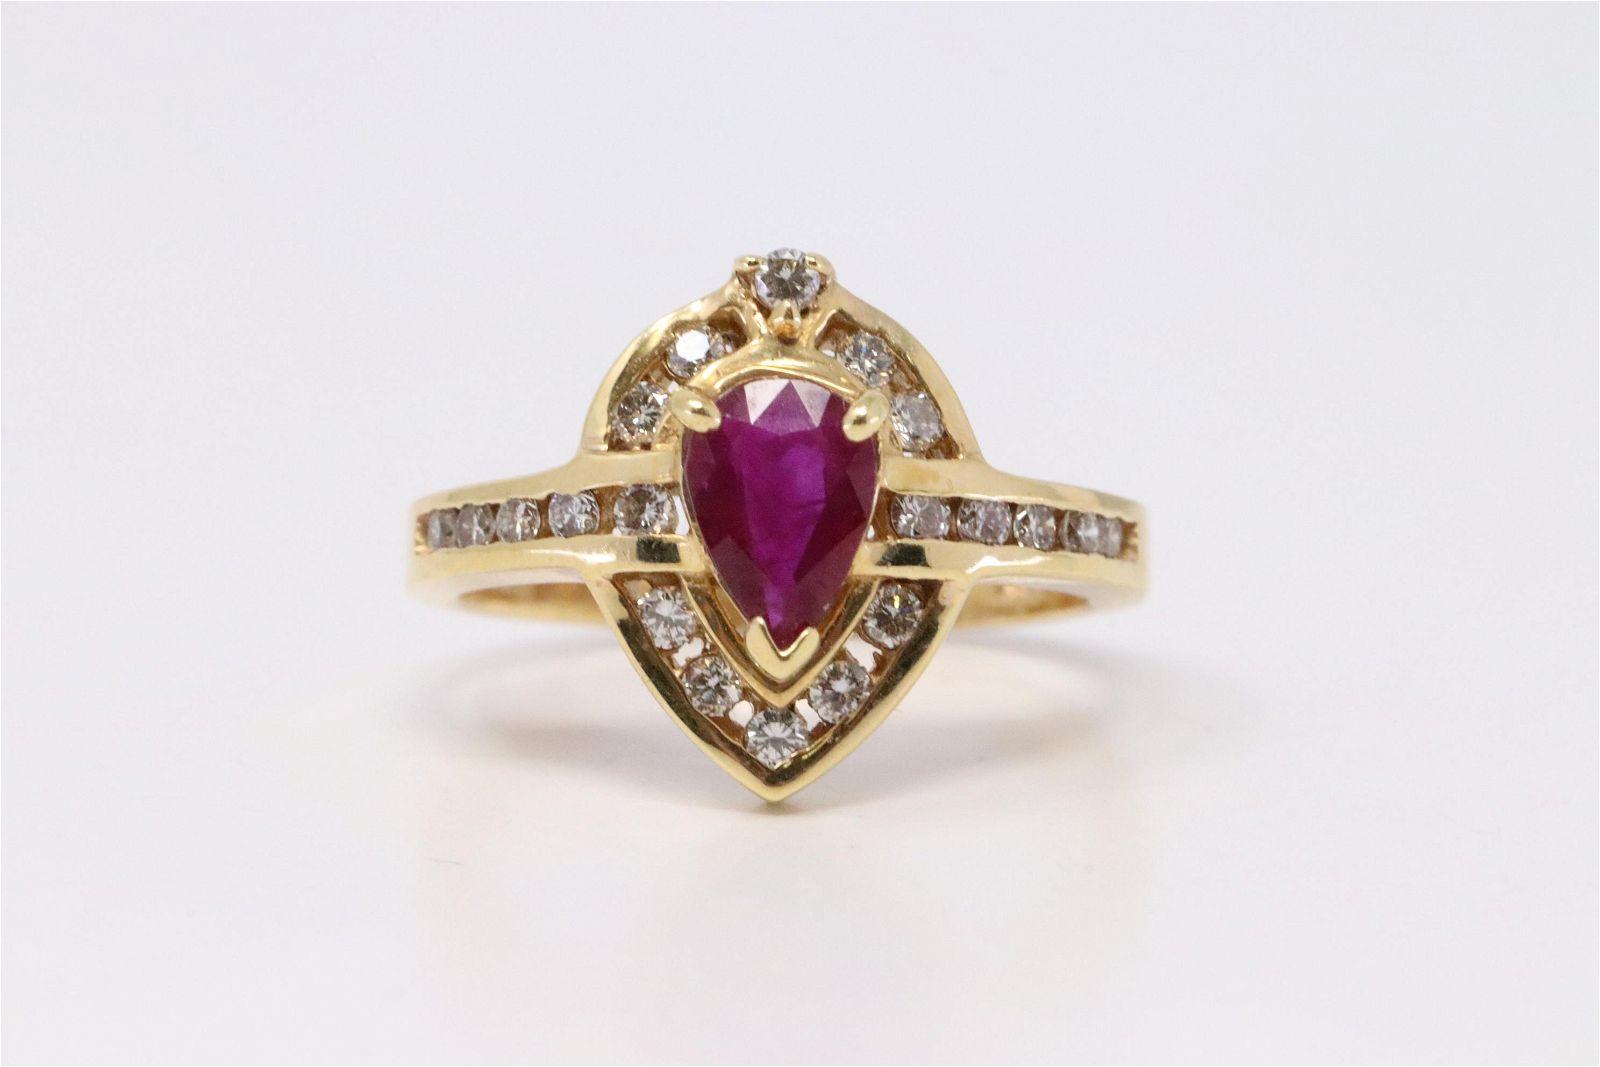 14Kt Yellow Gold Ruby Diamond Ring.